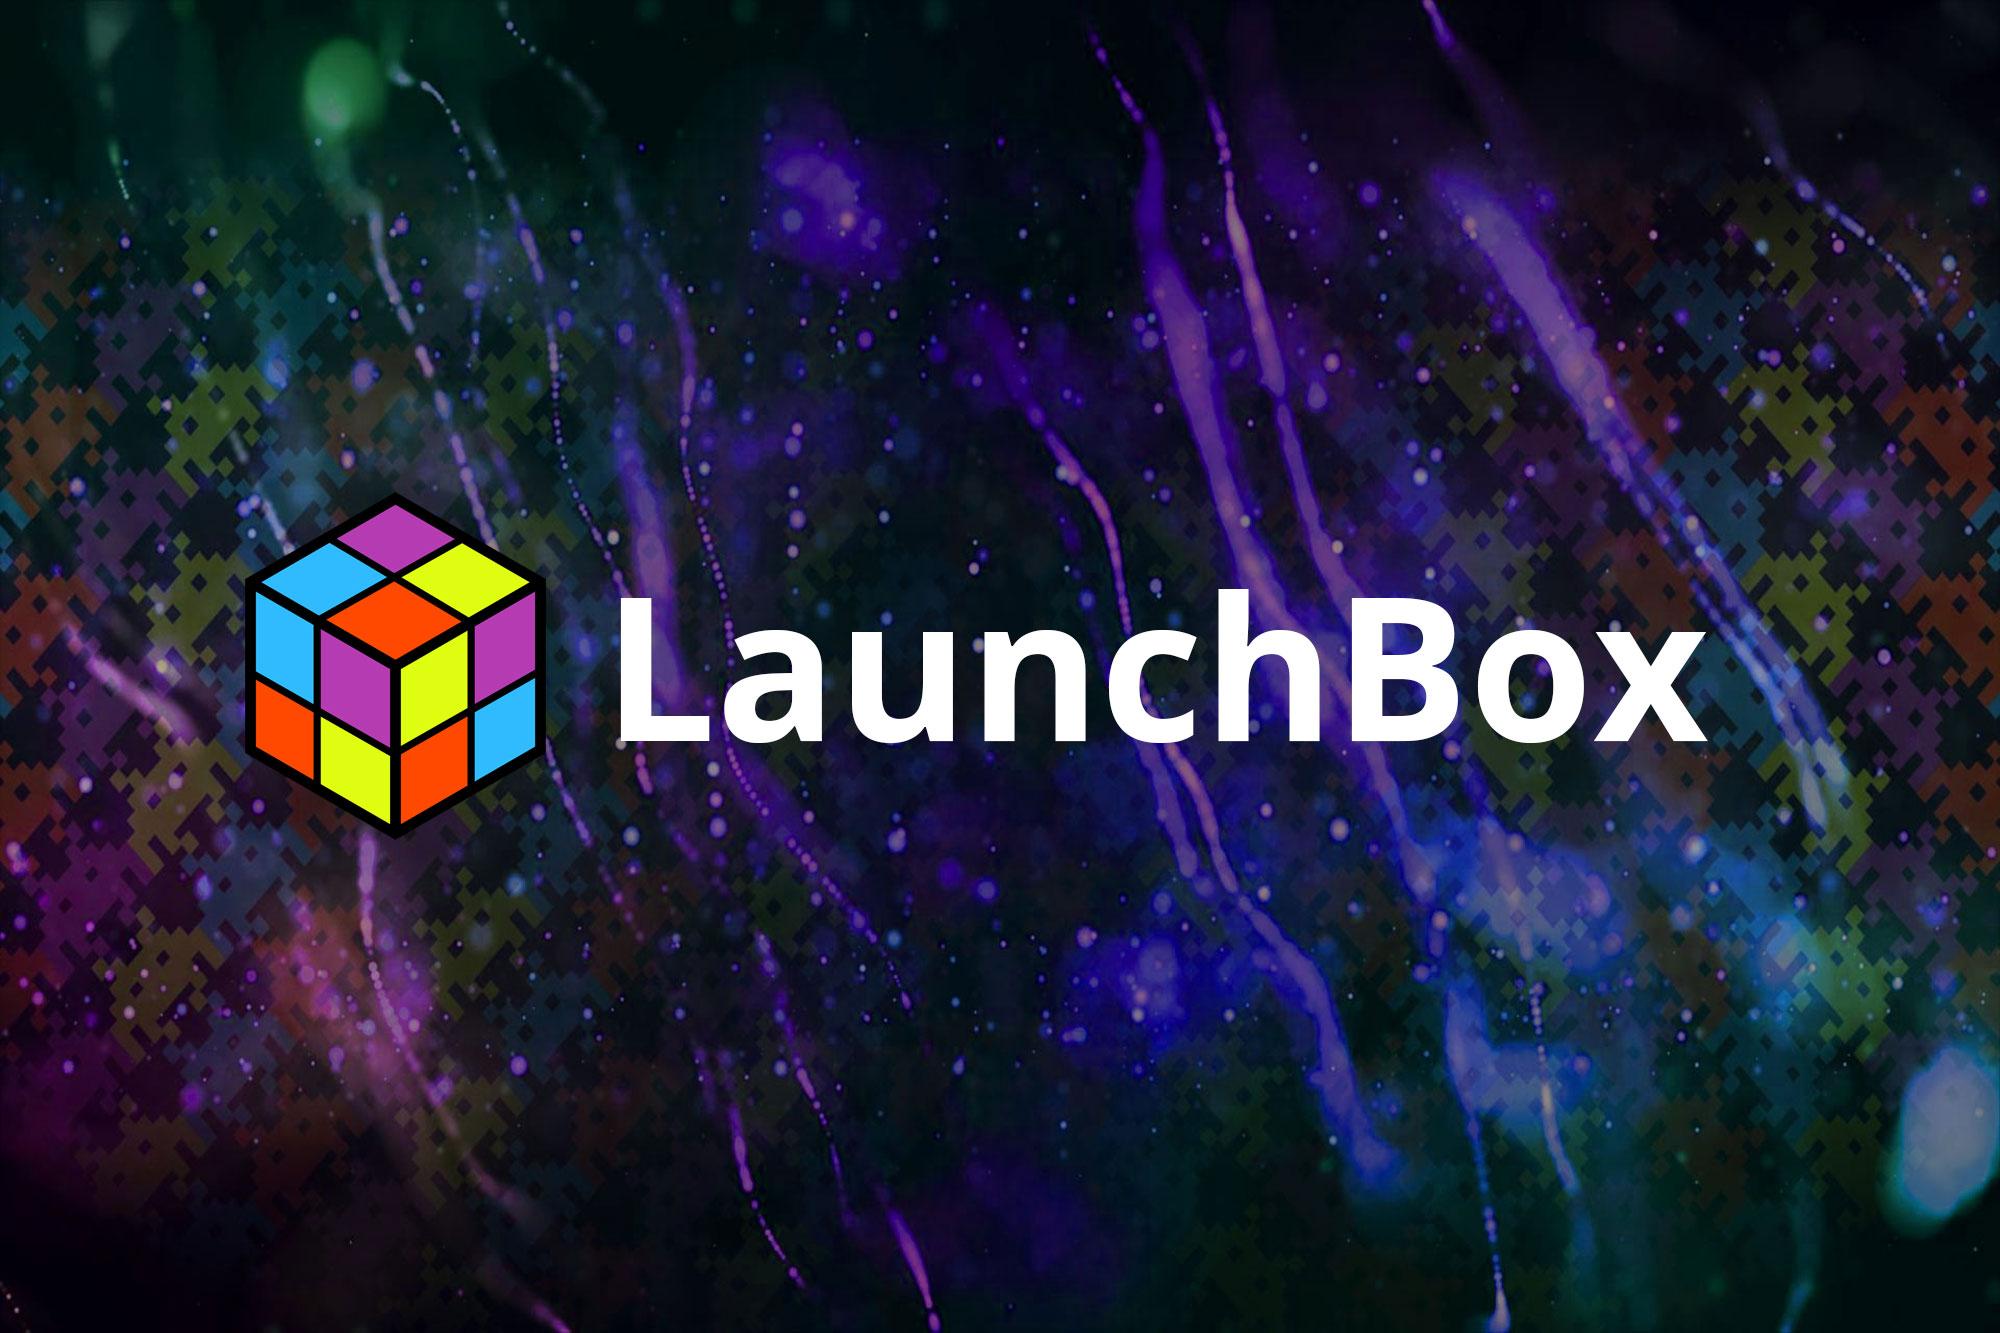 LaunchBox Website Design